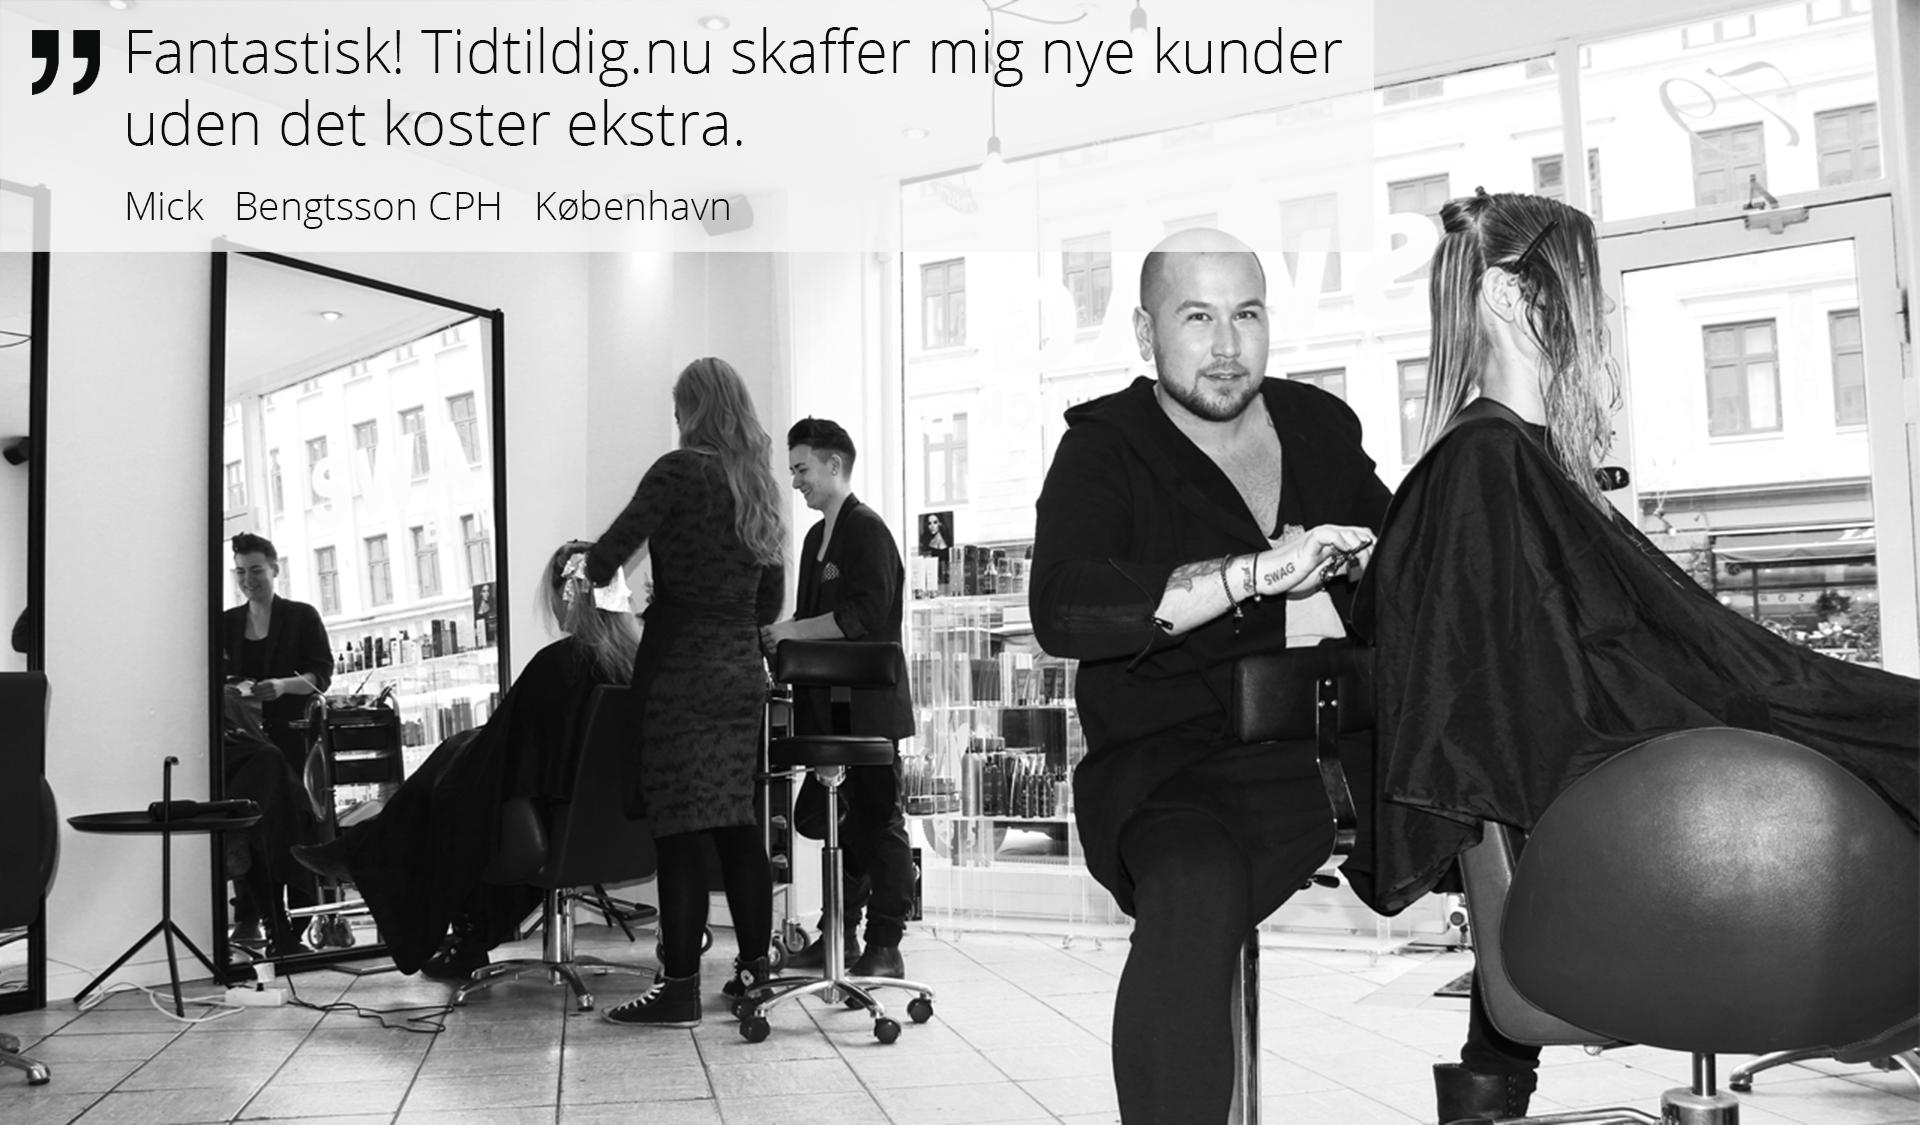 BengtssonCPH